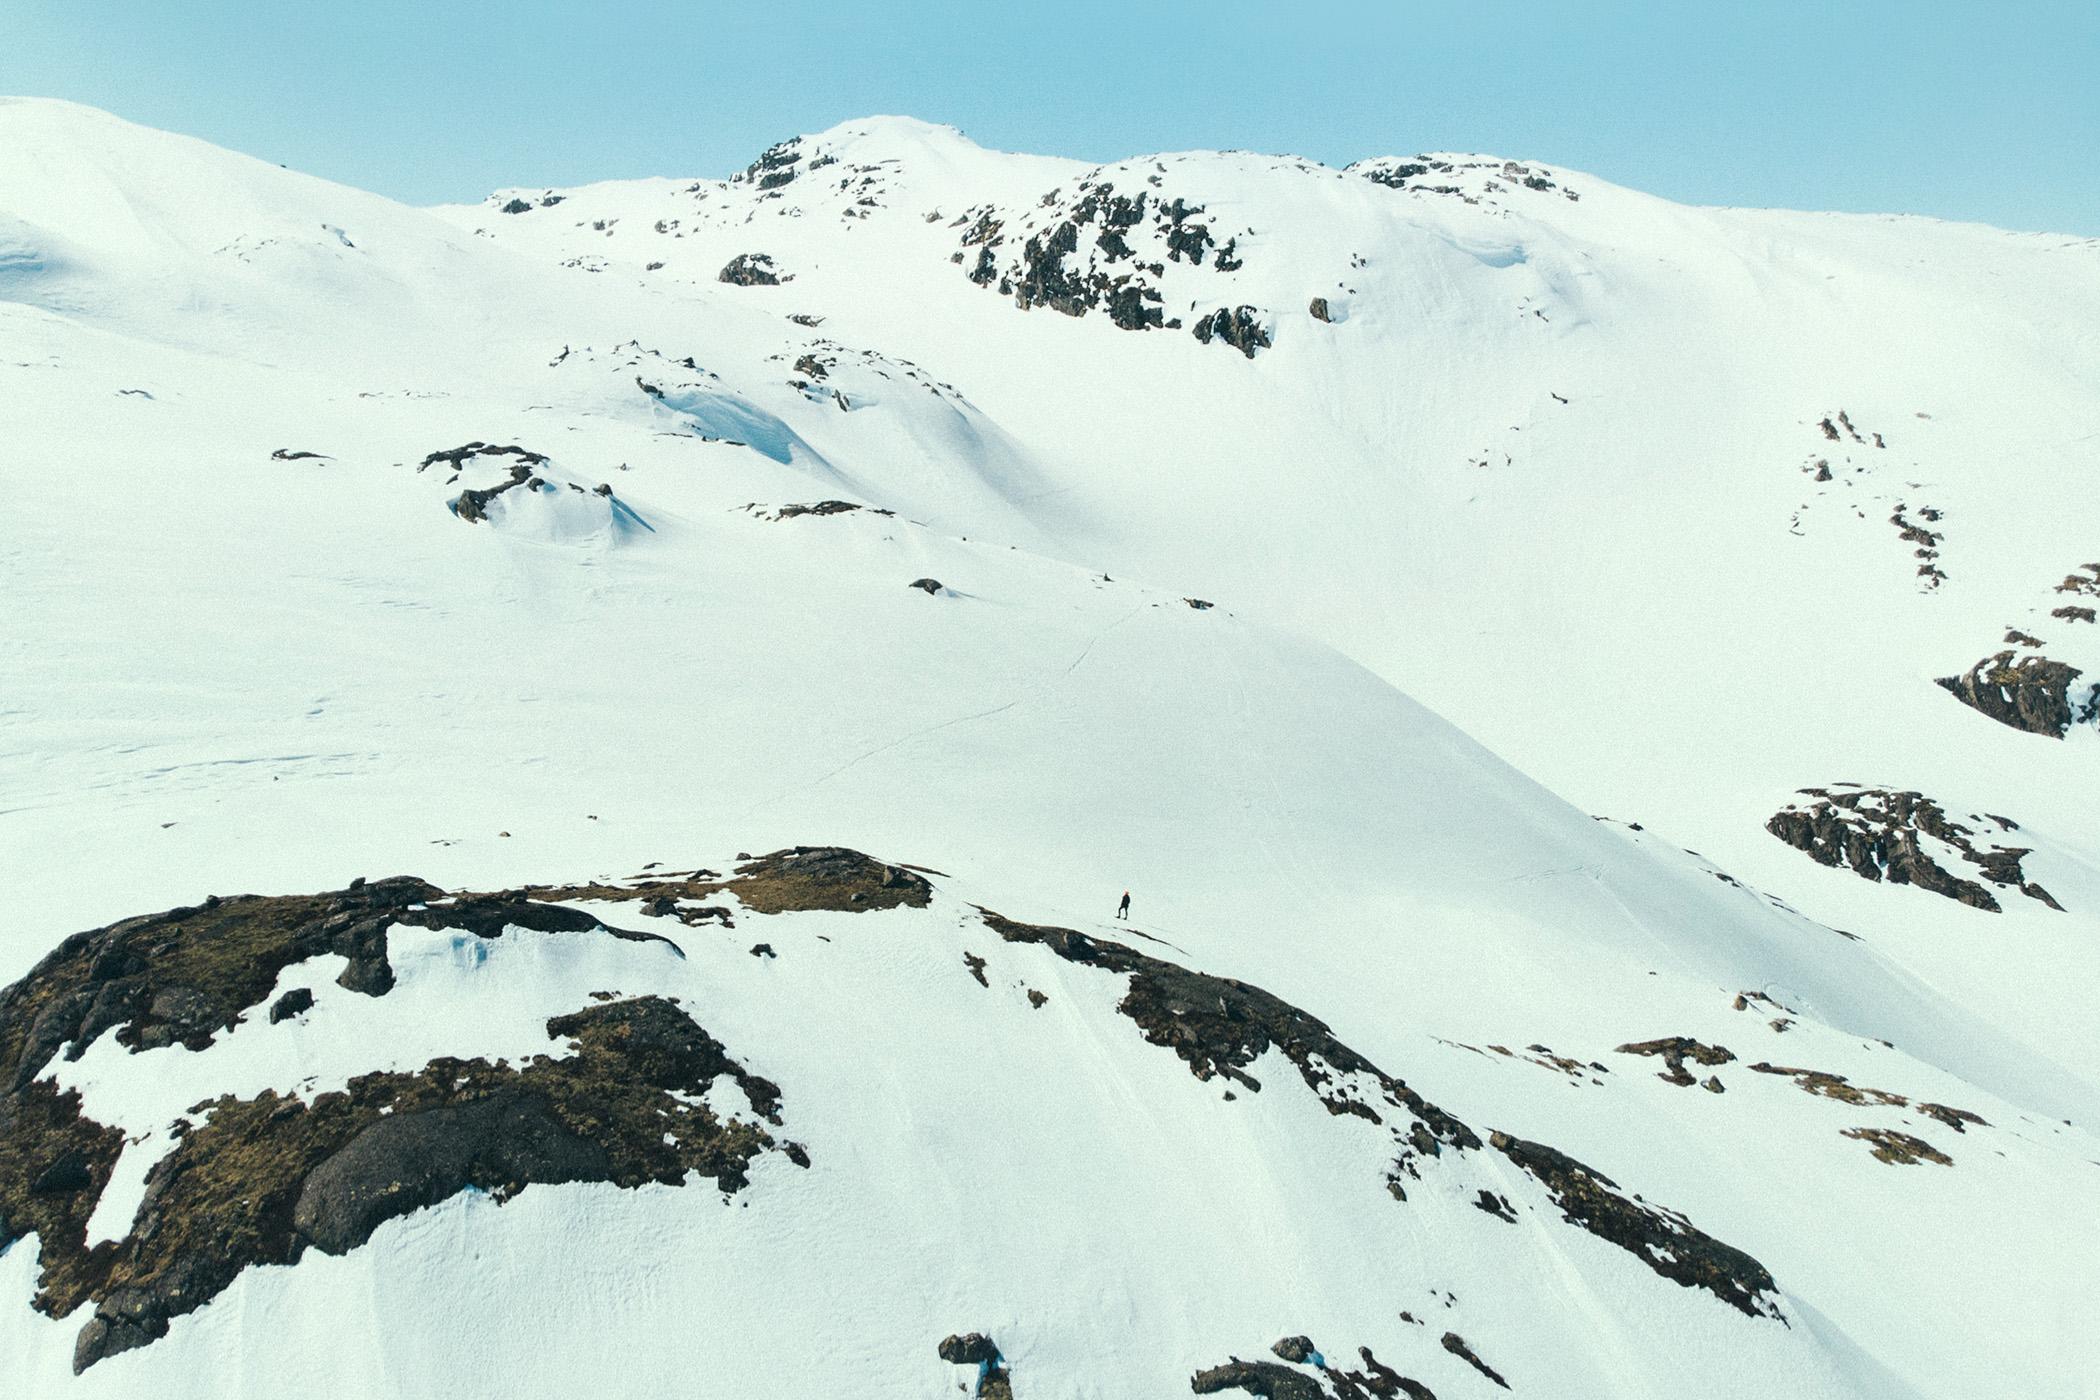 snowshoe hike, Myrdalen, góry, wiosna